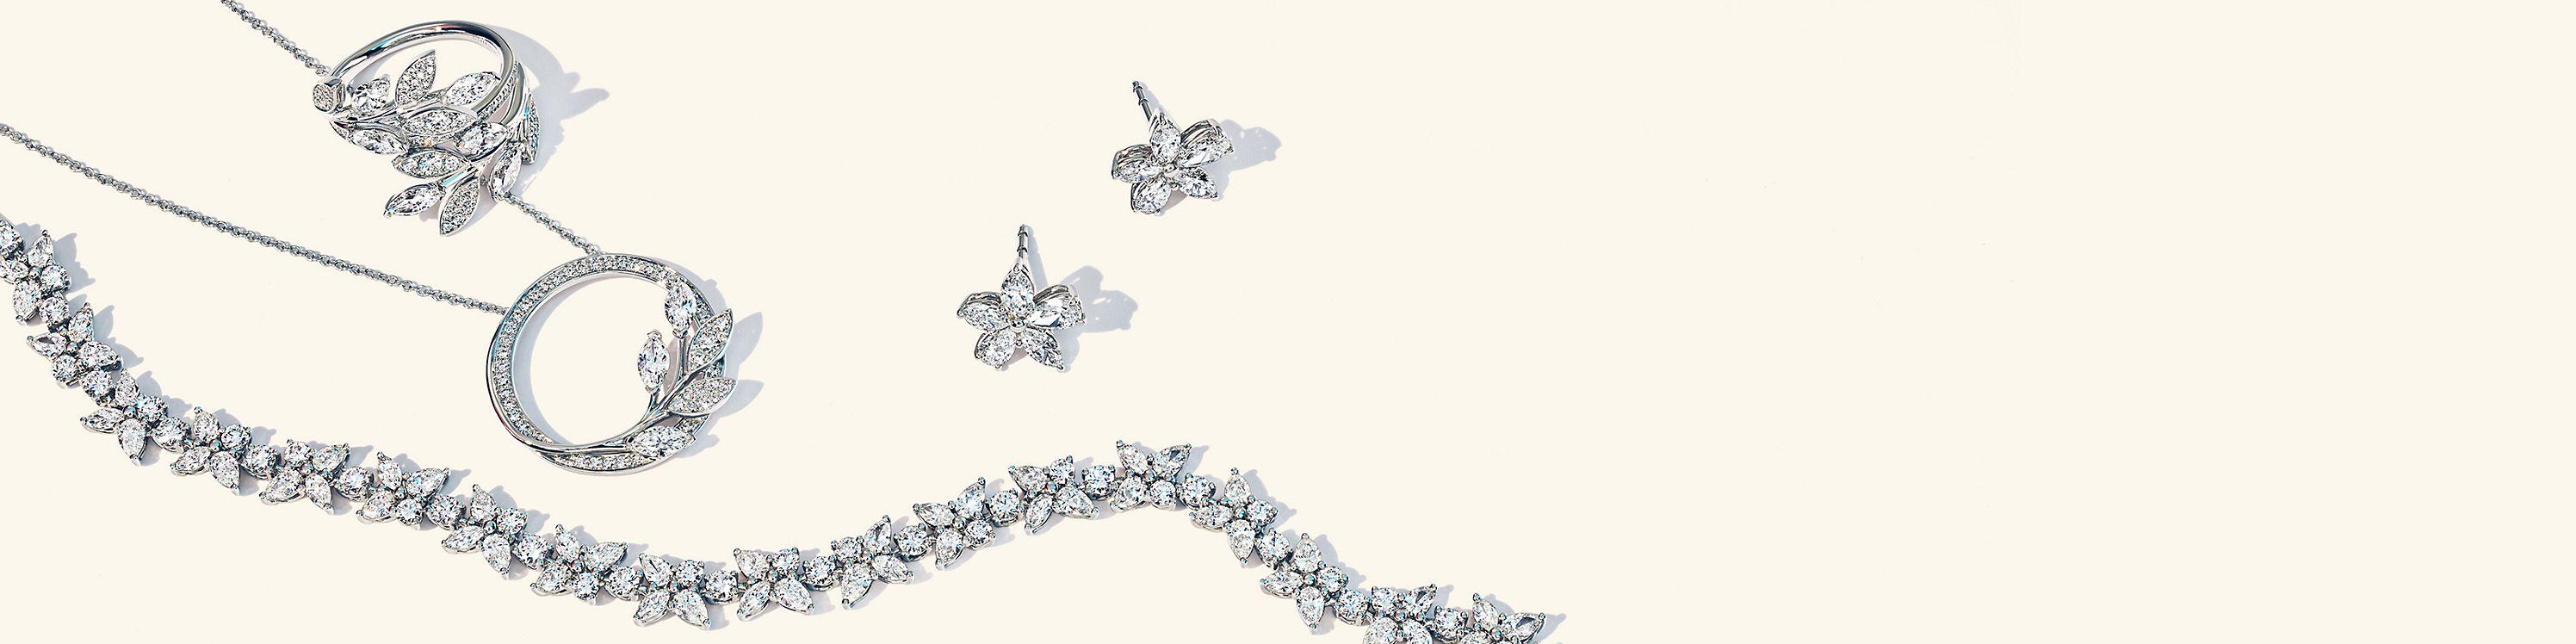 Tiffany Victoria® Jewelry